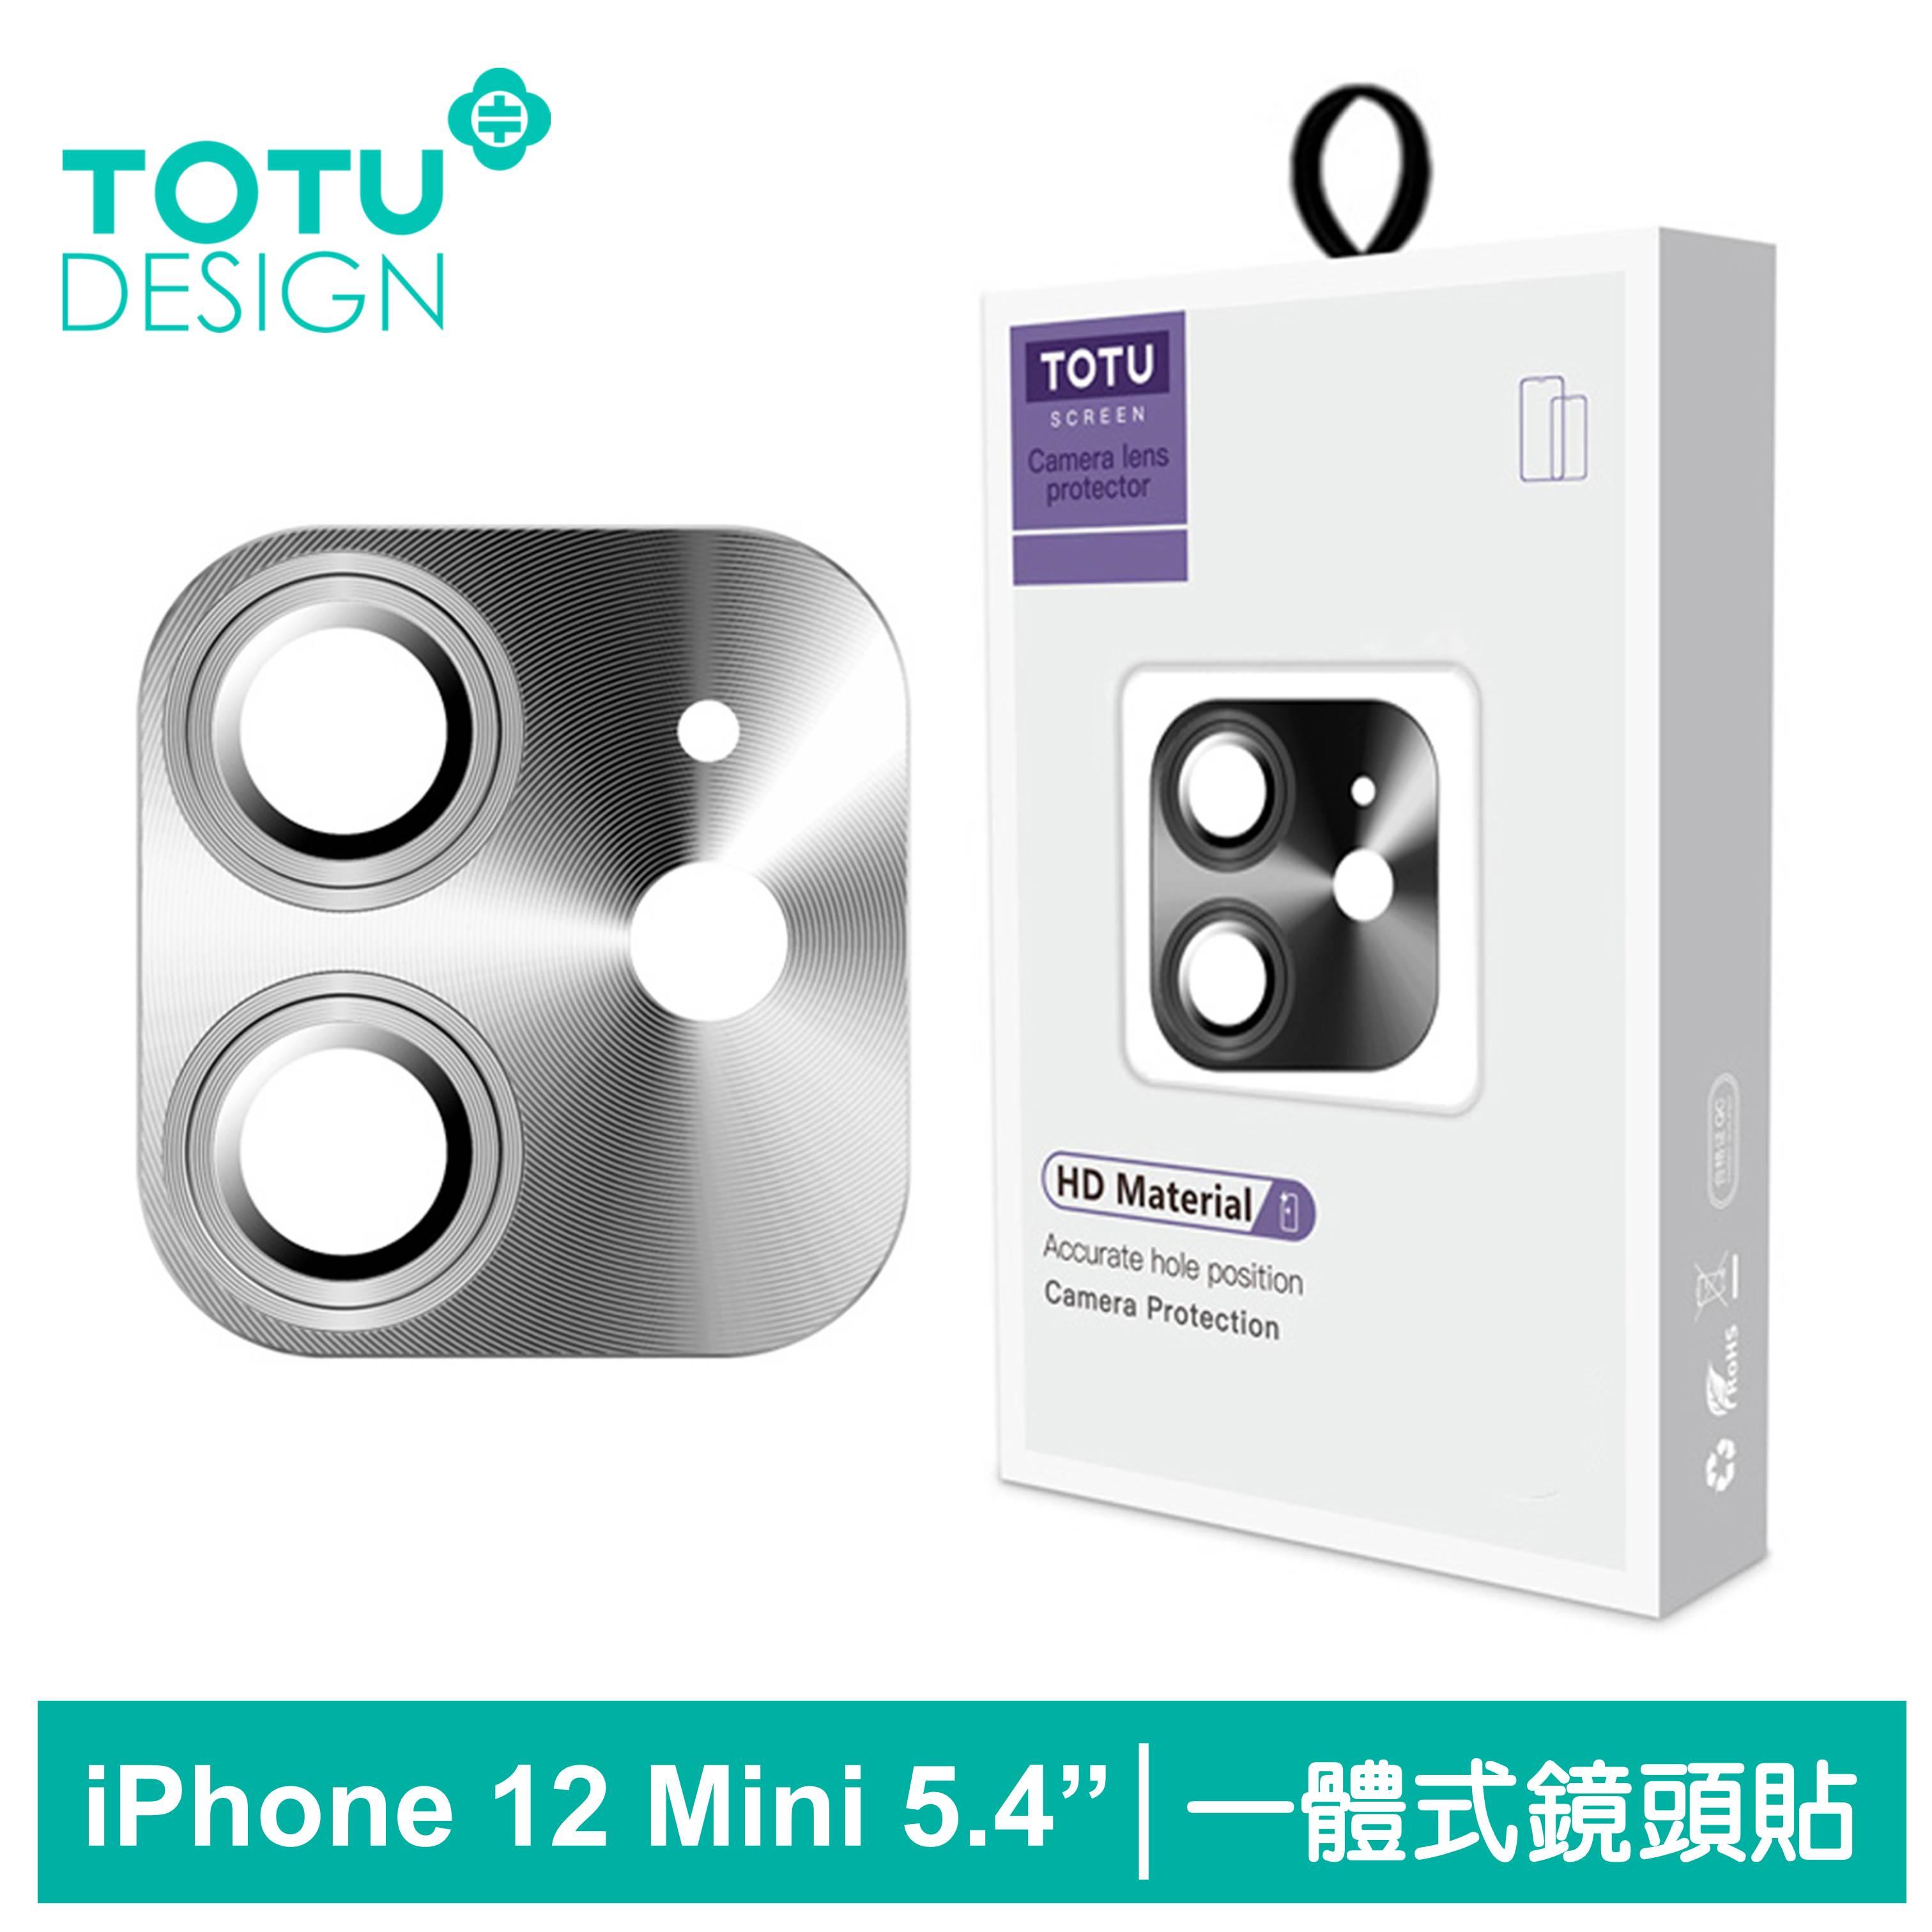 TOTU台灣官方 iPhone 12 Mini 鏡頭貼 i12 Mini 5.4吋 鋼化膜 保護貼 一體式鋁合金鋼化玻璃 鎧甲系列 銀色